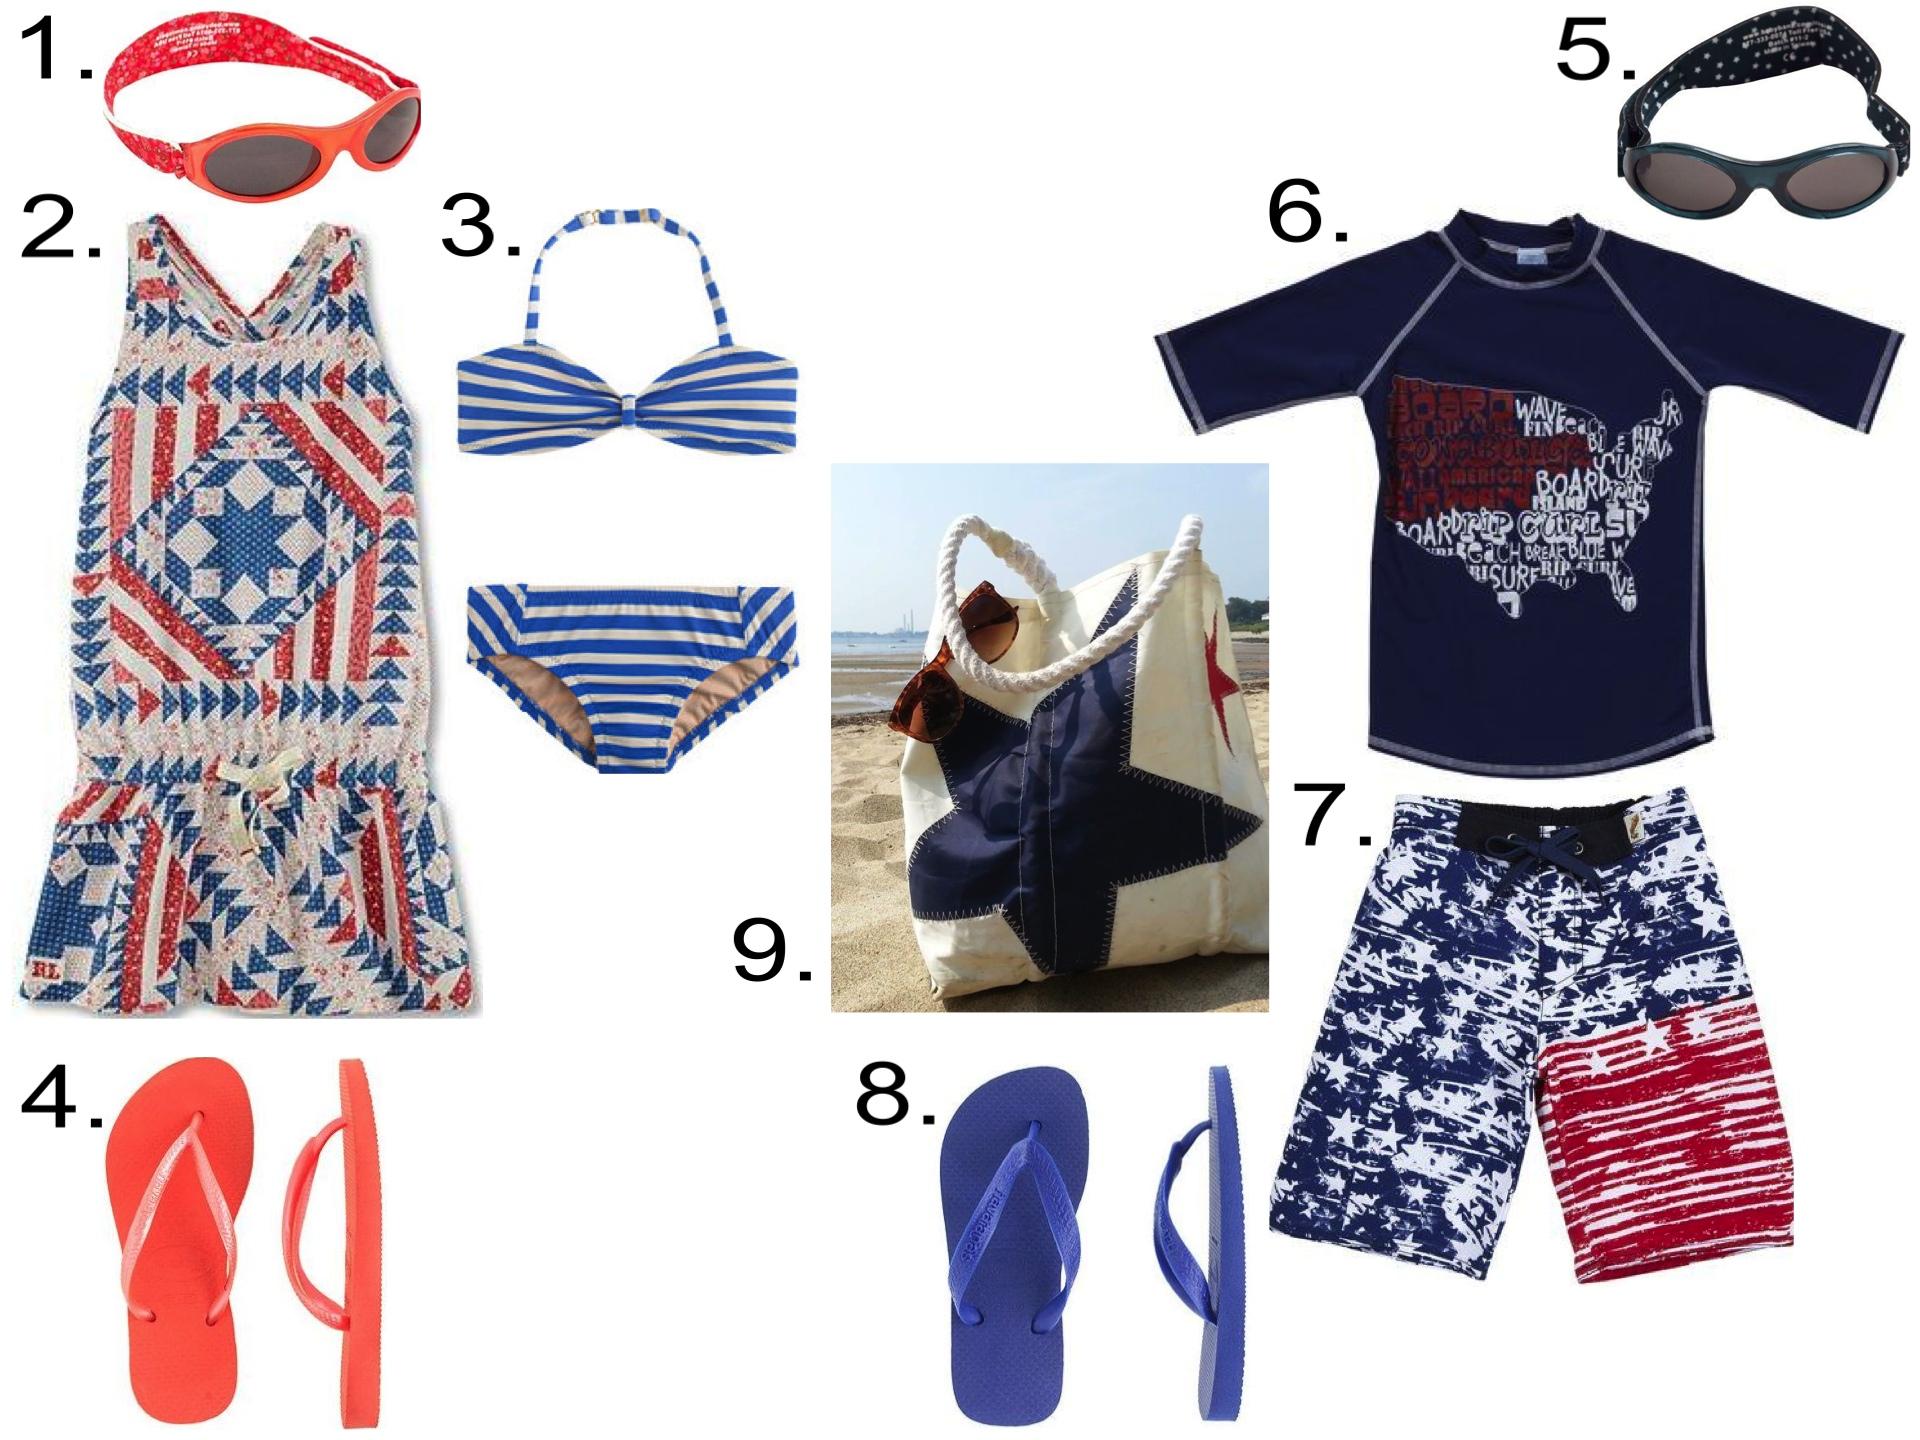 4th of July at the Beach...  1.  Baby Banz Adventure Banz Kidz  2.  Ralph Lauren Patchwork Dress  3.  J.Crew BIKINI SET IN THIN STRIPE  4. KIDS' HAVAIANAS® SLIM FLIP-FLOPS  5.  Baby Banz Adventure Banz Kidz  6.  Charlie Rocket USA Map Rashguard  7.  Charlie Rocket Flag Swim Shorts  8.  KIDS' HAVAIANAS® TOP FLIP-FLOPS  9.  Sea Bags Two Star Tote